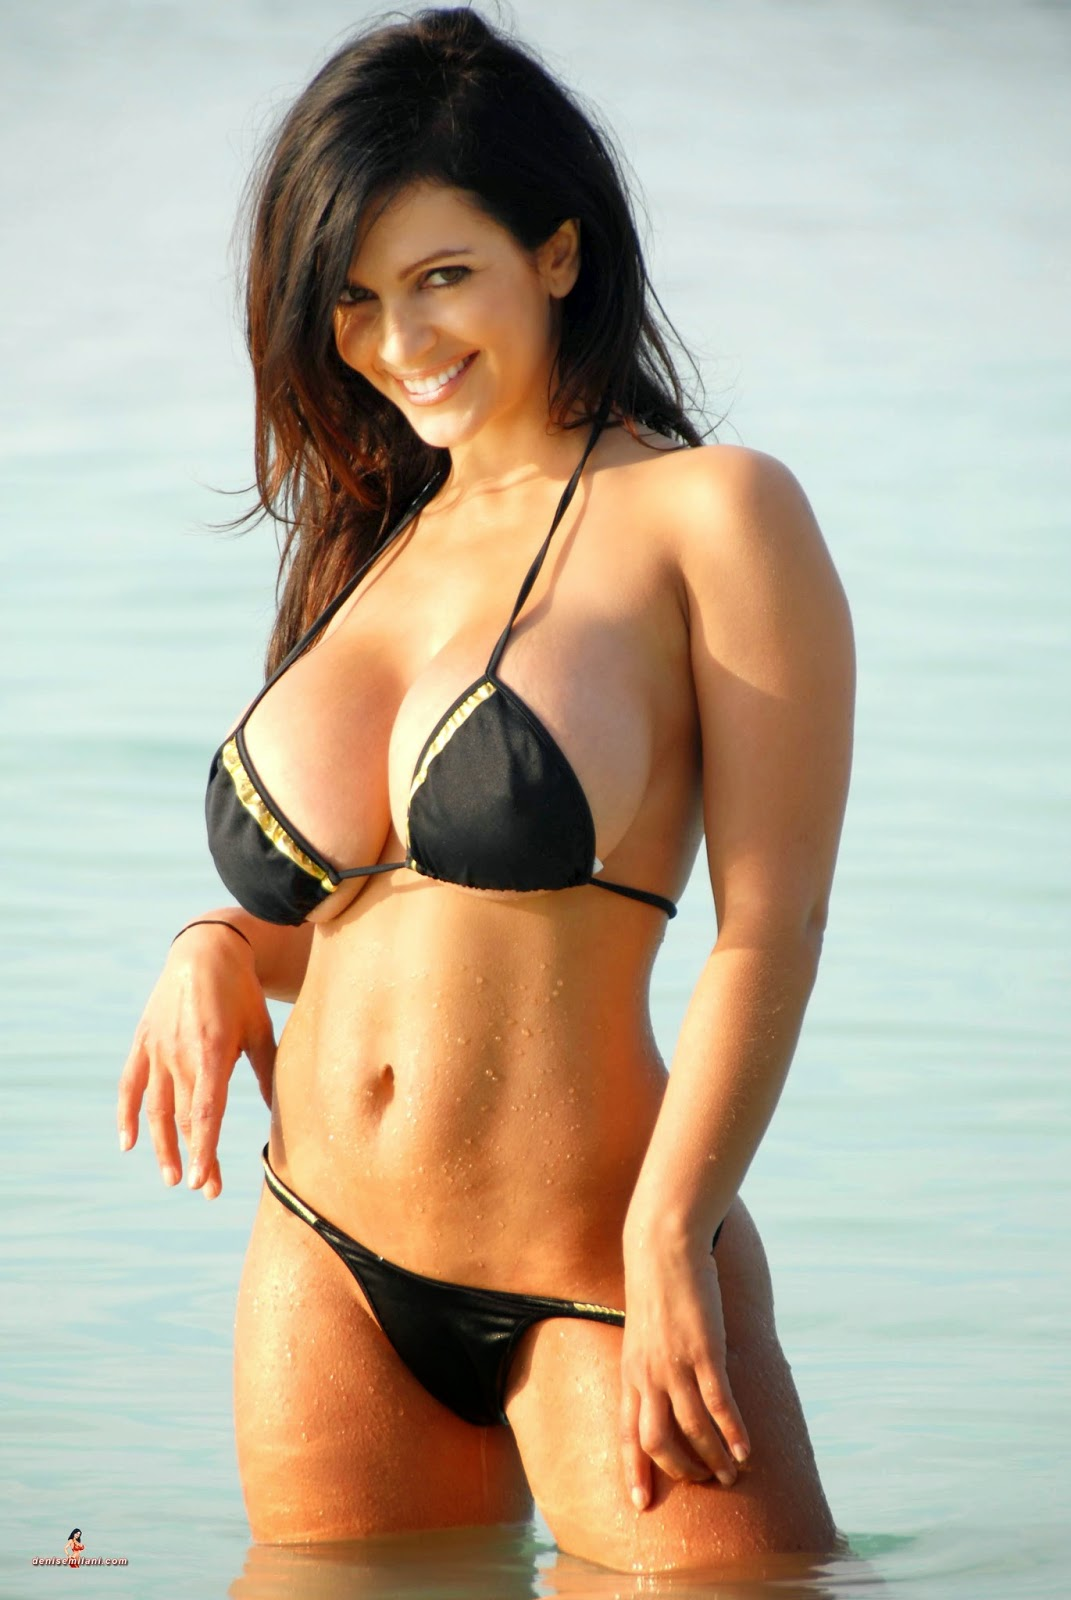 Denise Milani Archives Beach Black Hot Bikini-7967